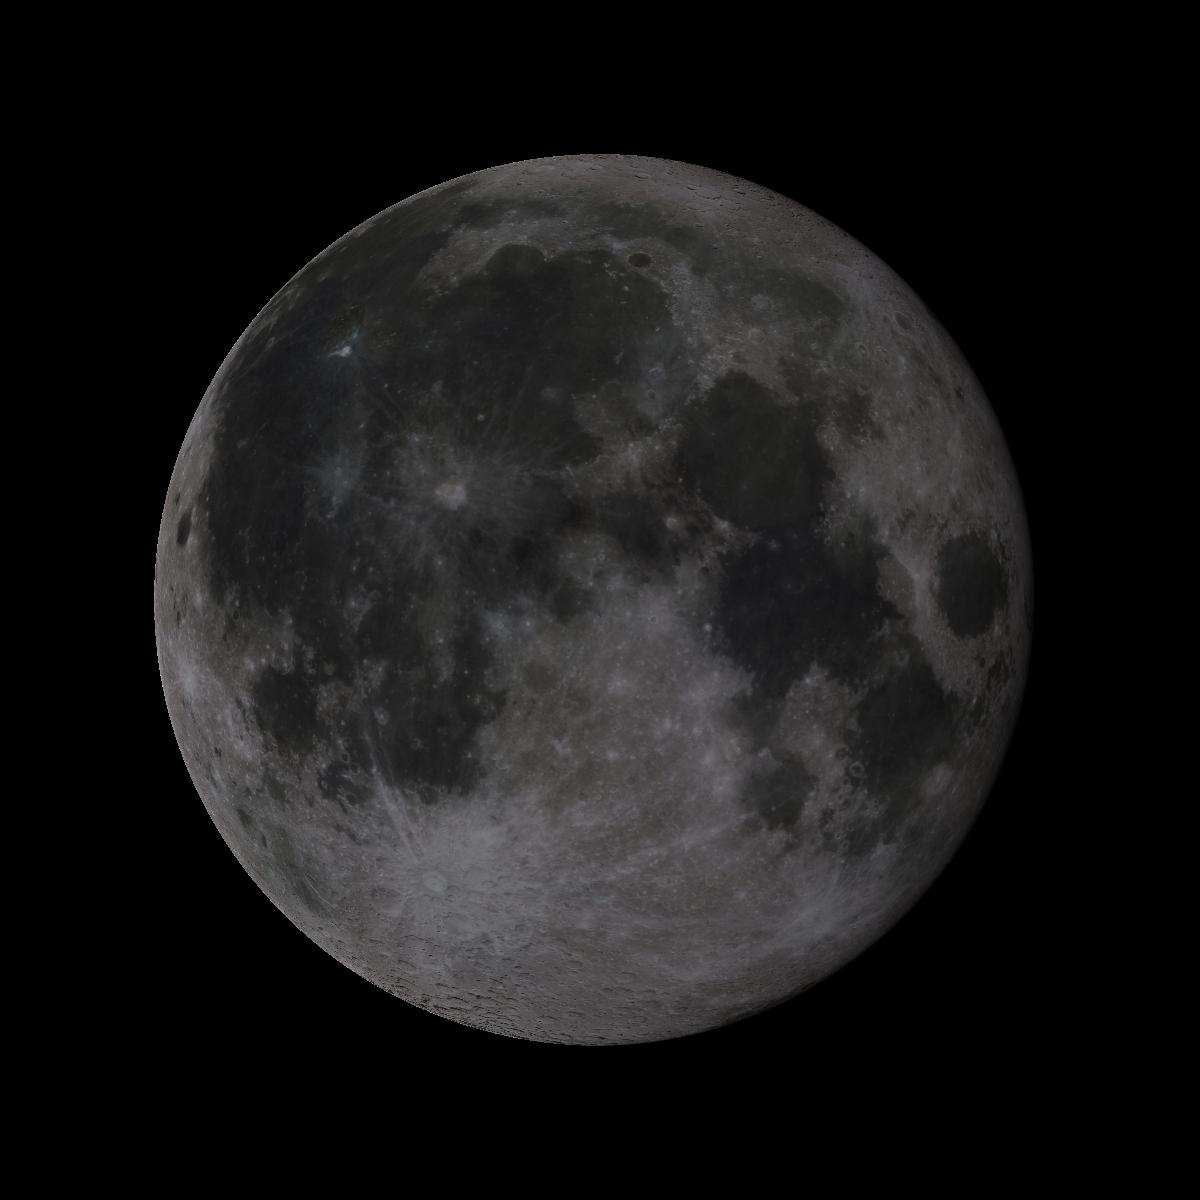 Lune du 18 juillet 2019